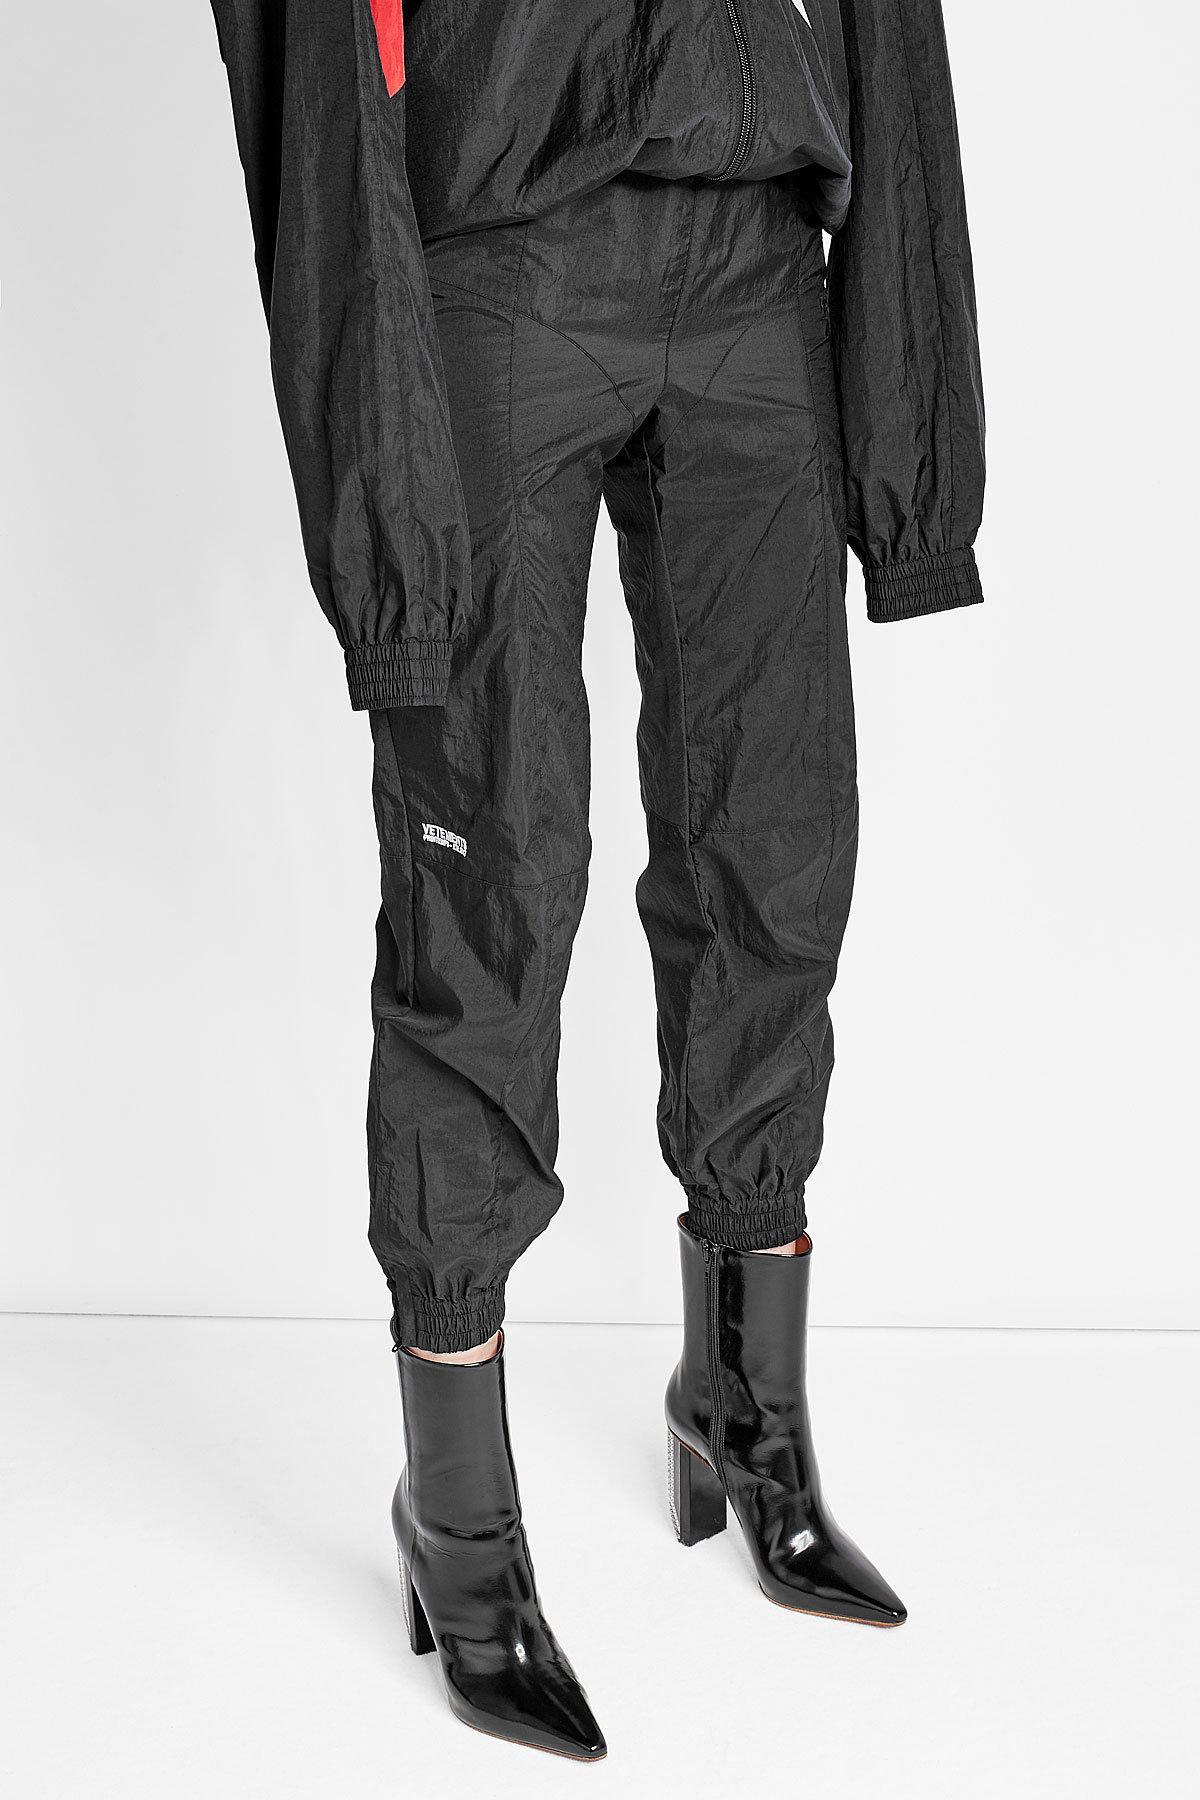 Lyst - Vetements X Reebok Cropped Track Pants In Black-2179